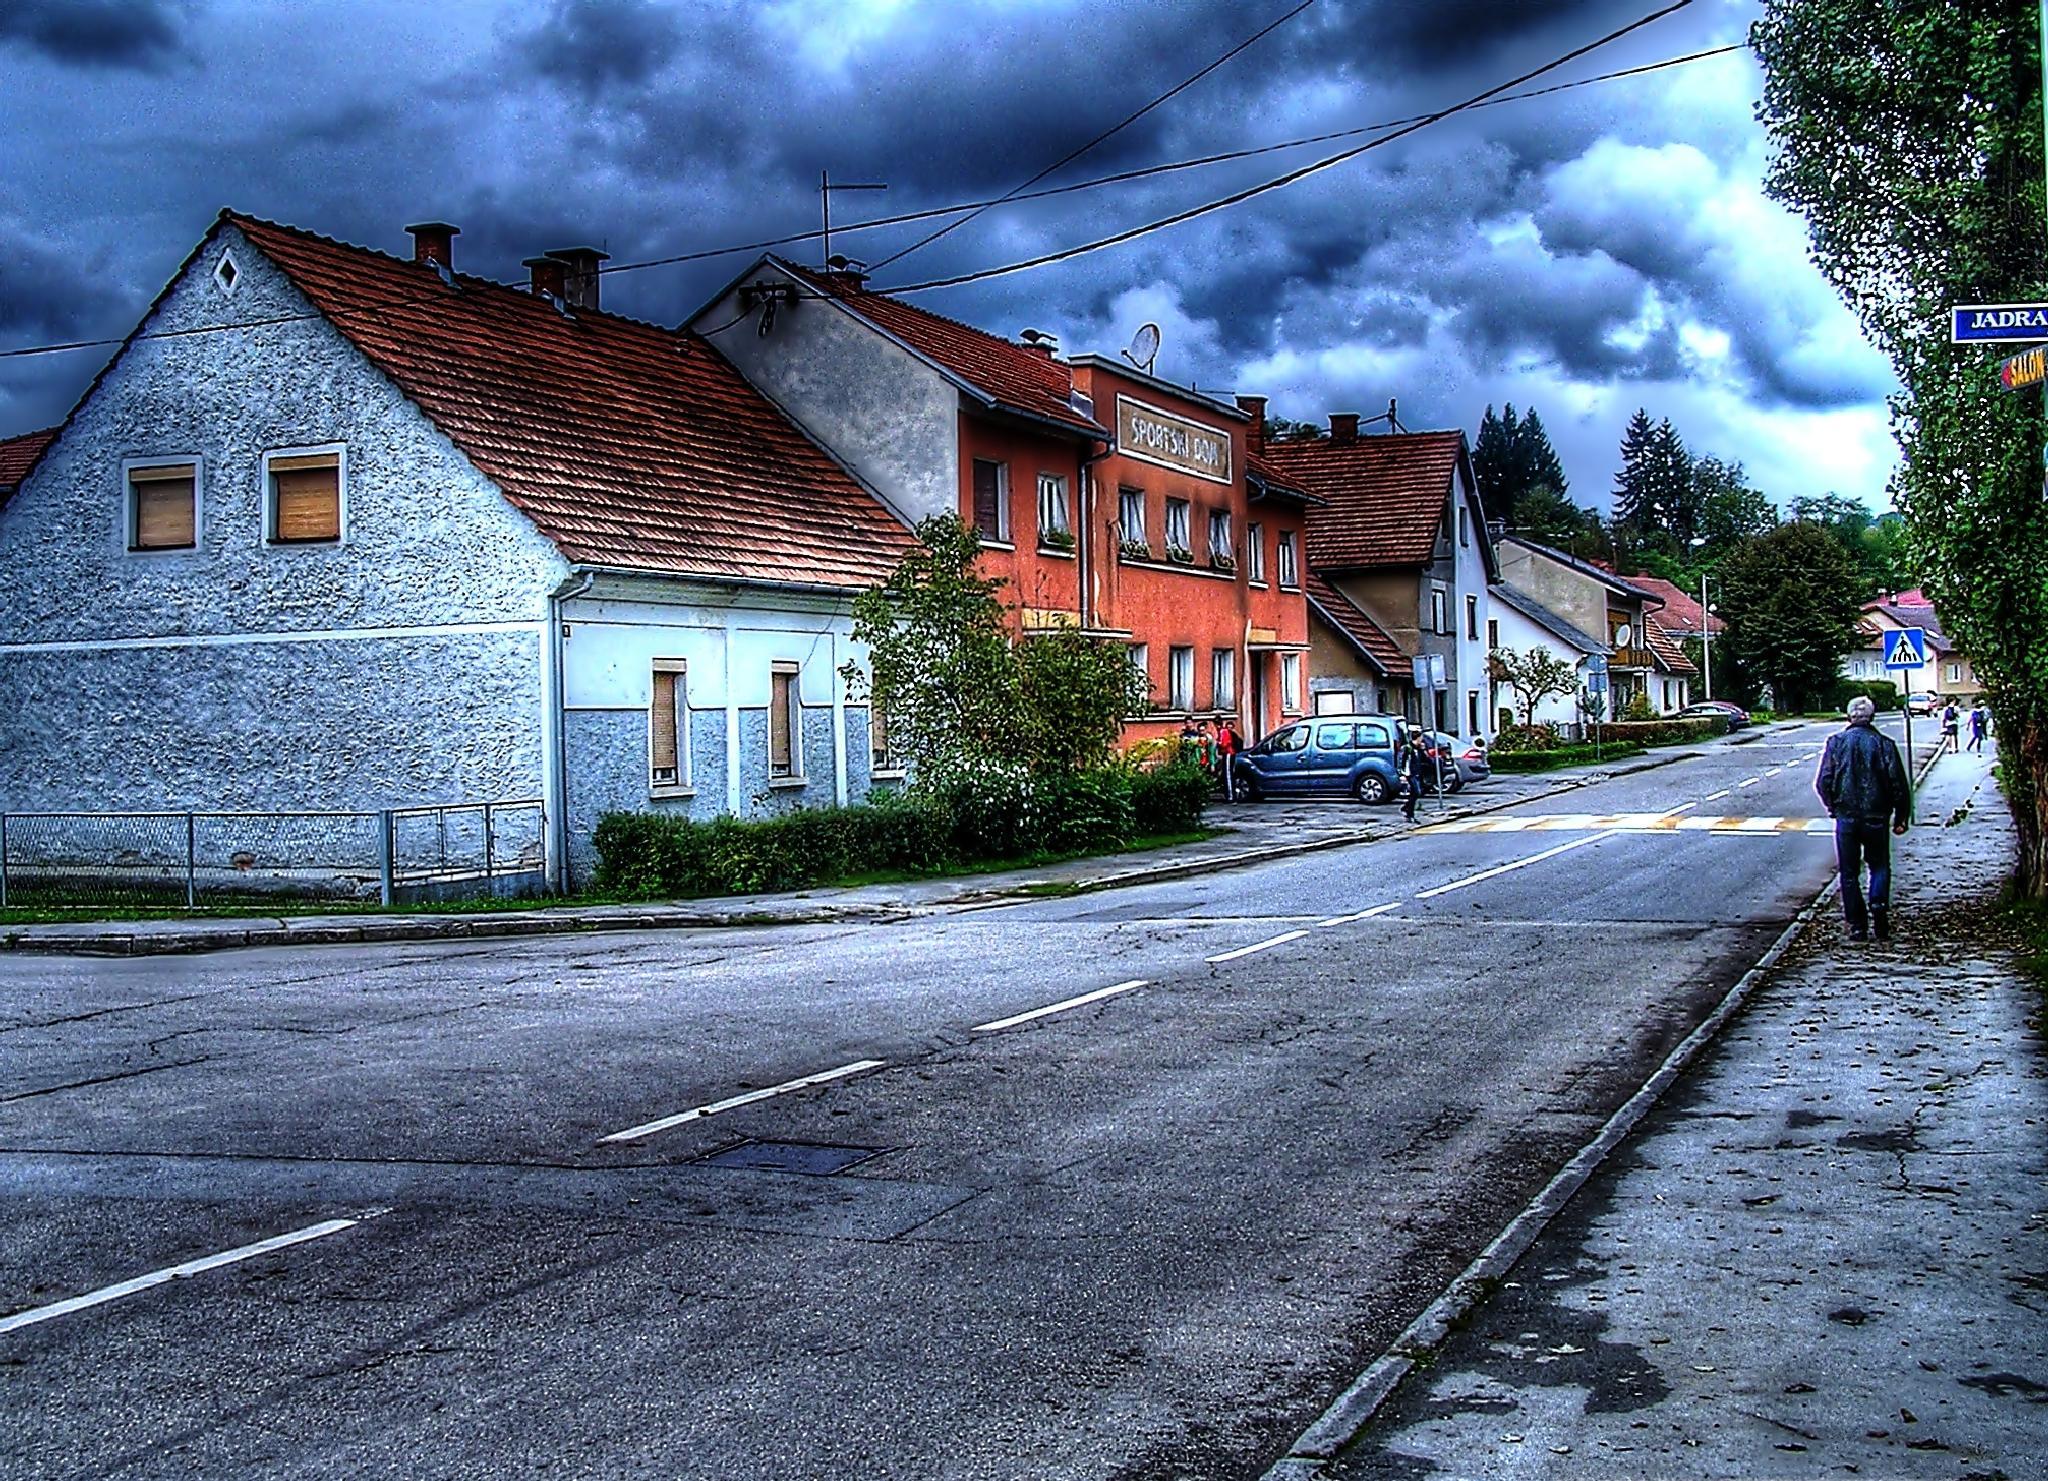 Street of Duga Resa 1 by Antun Marakovic